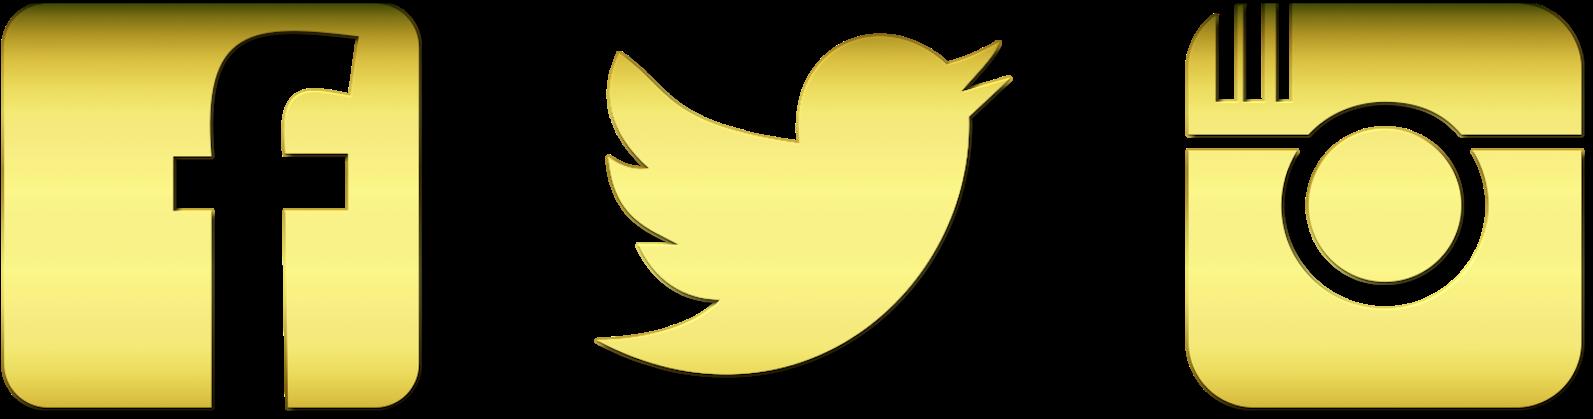 Clip Art Free Instagram Twitter Facebook Icons - Instagram Logo Gold Png Transparent Png (1600x454), Png Download